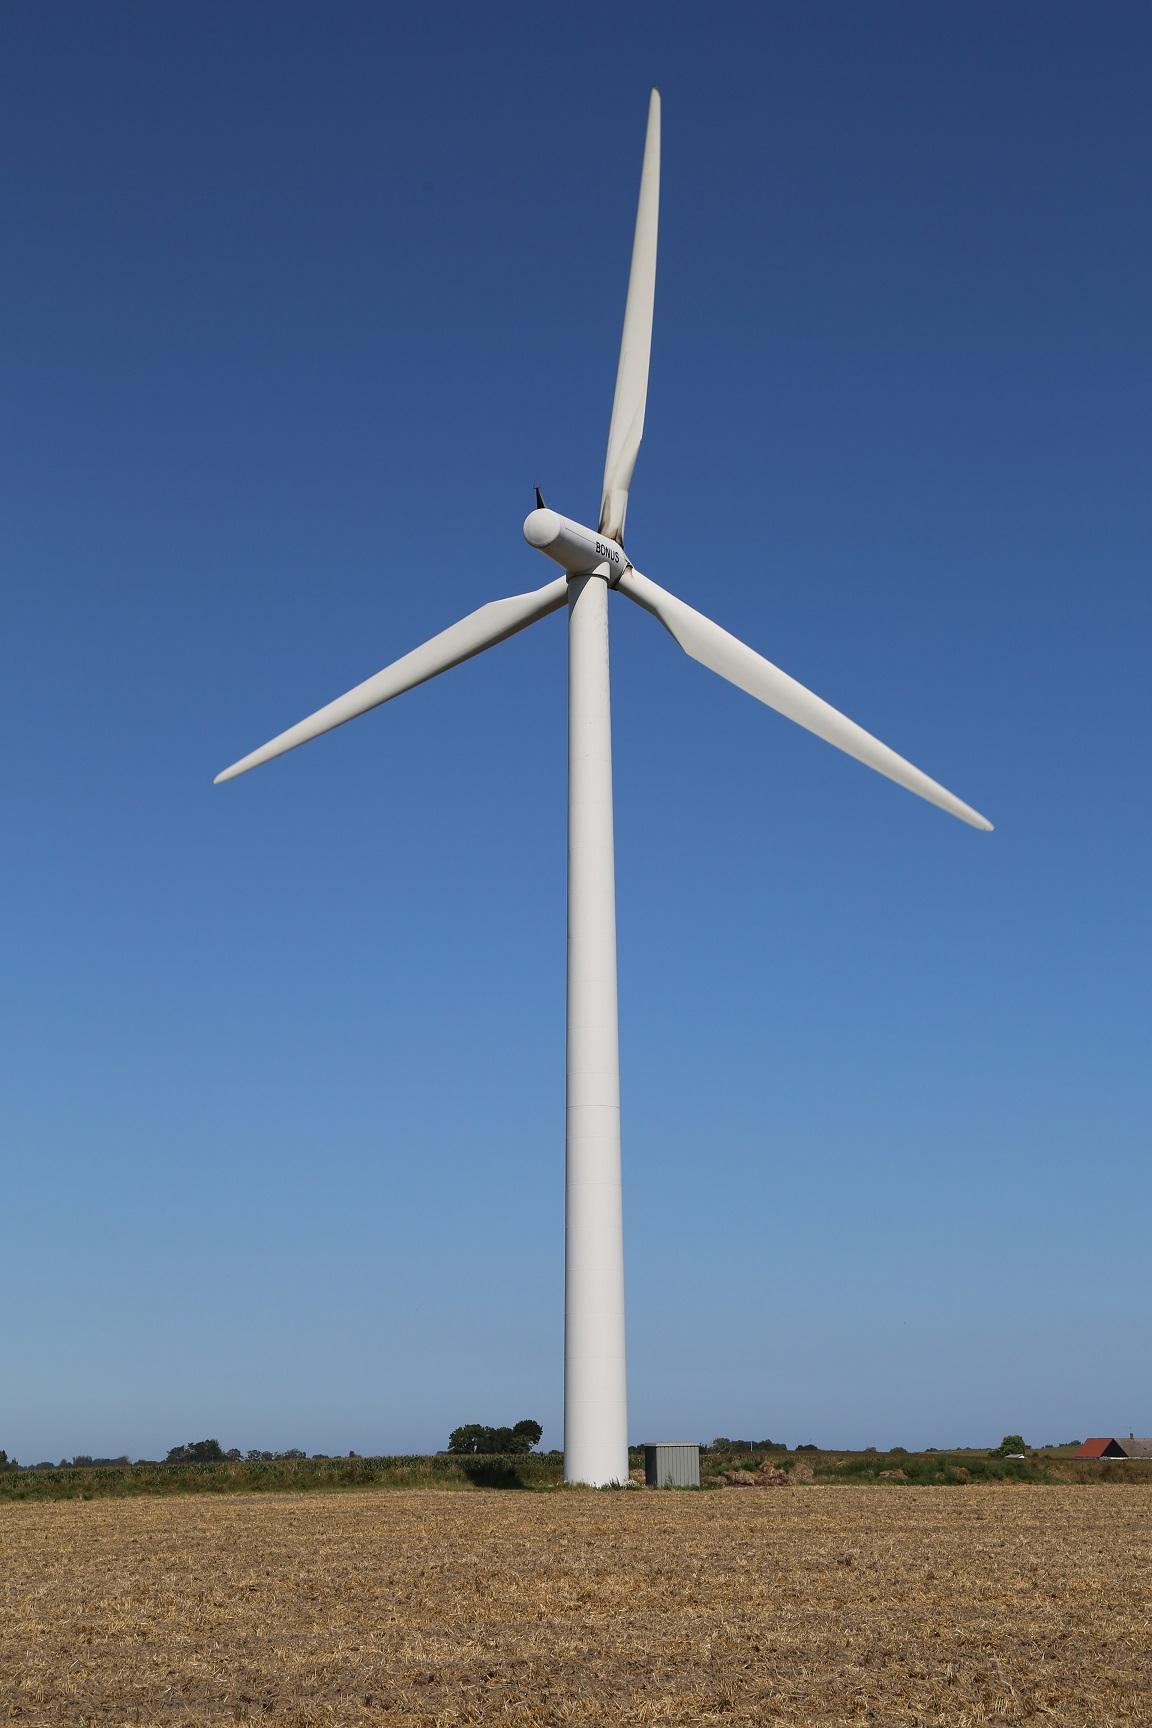 Bonus B54 1000 1 00 MW Wind turbine